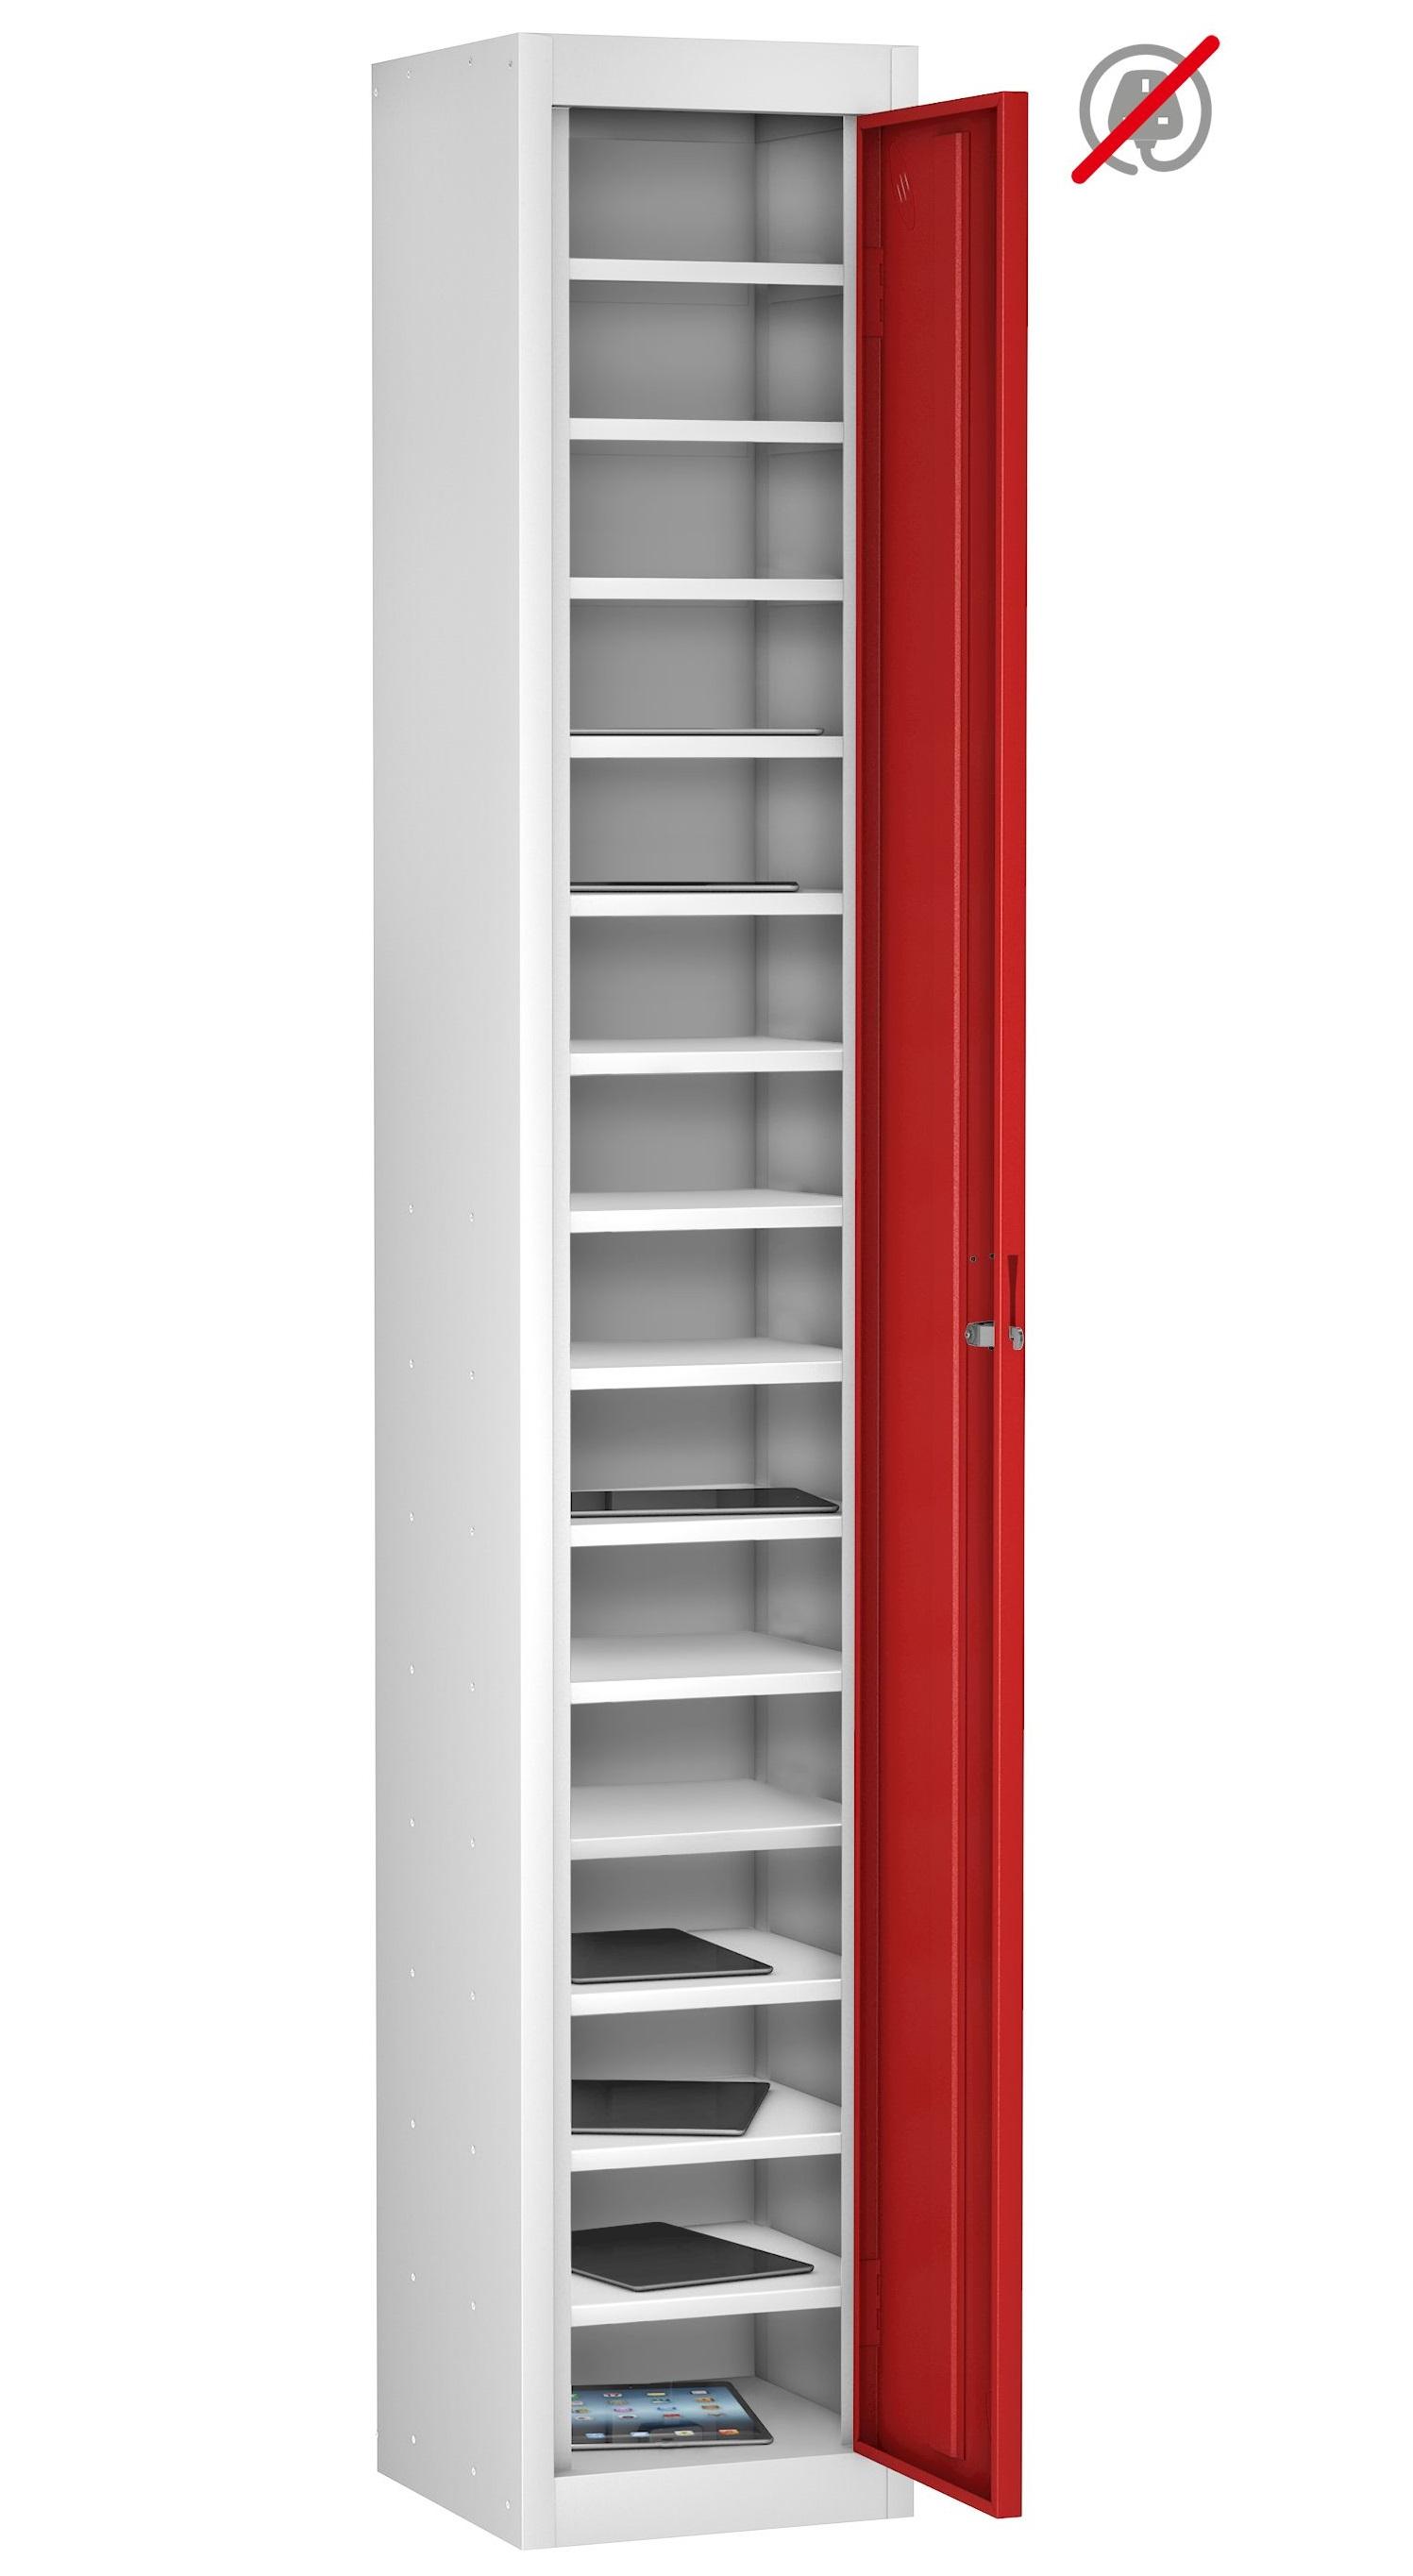 TABLET Locker Sgle Dr 15 Shelf - Non Charge